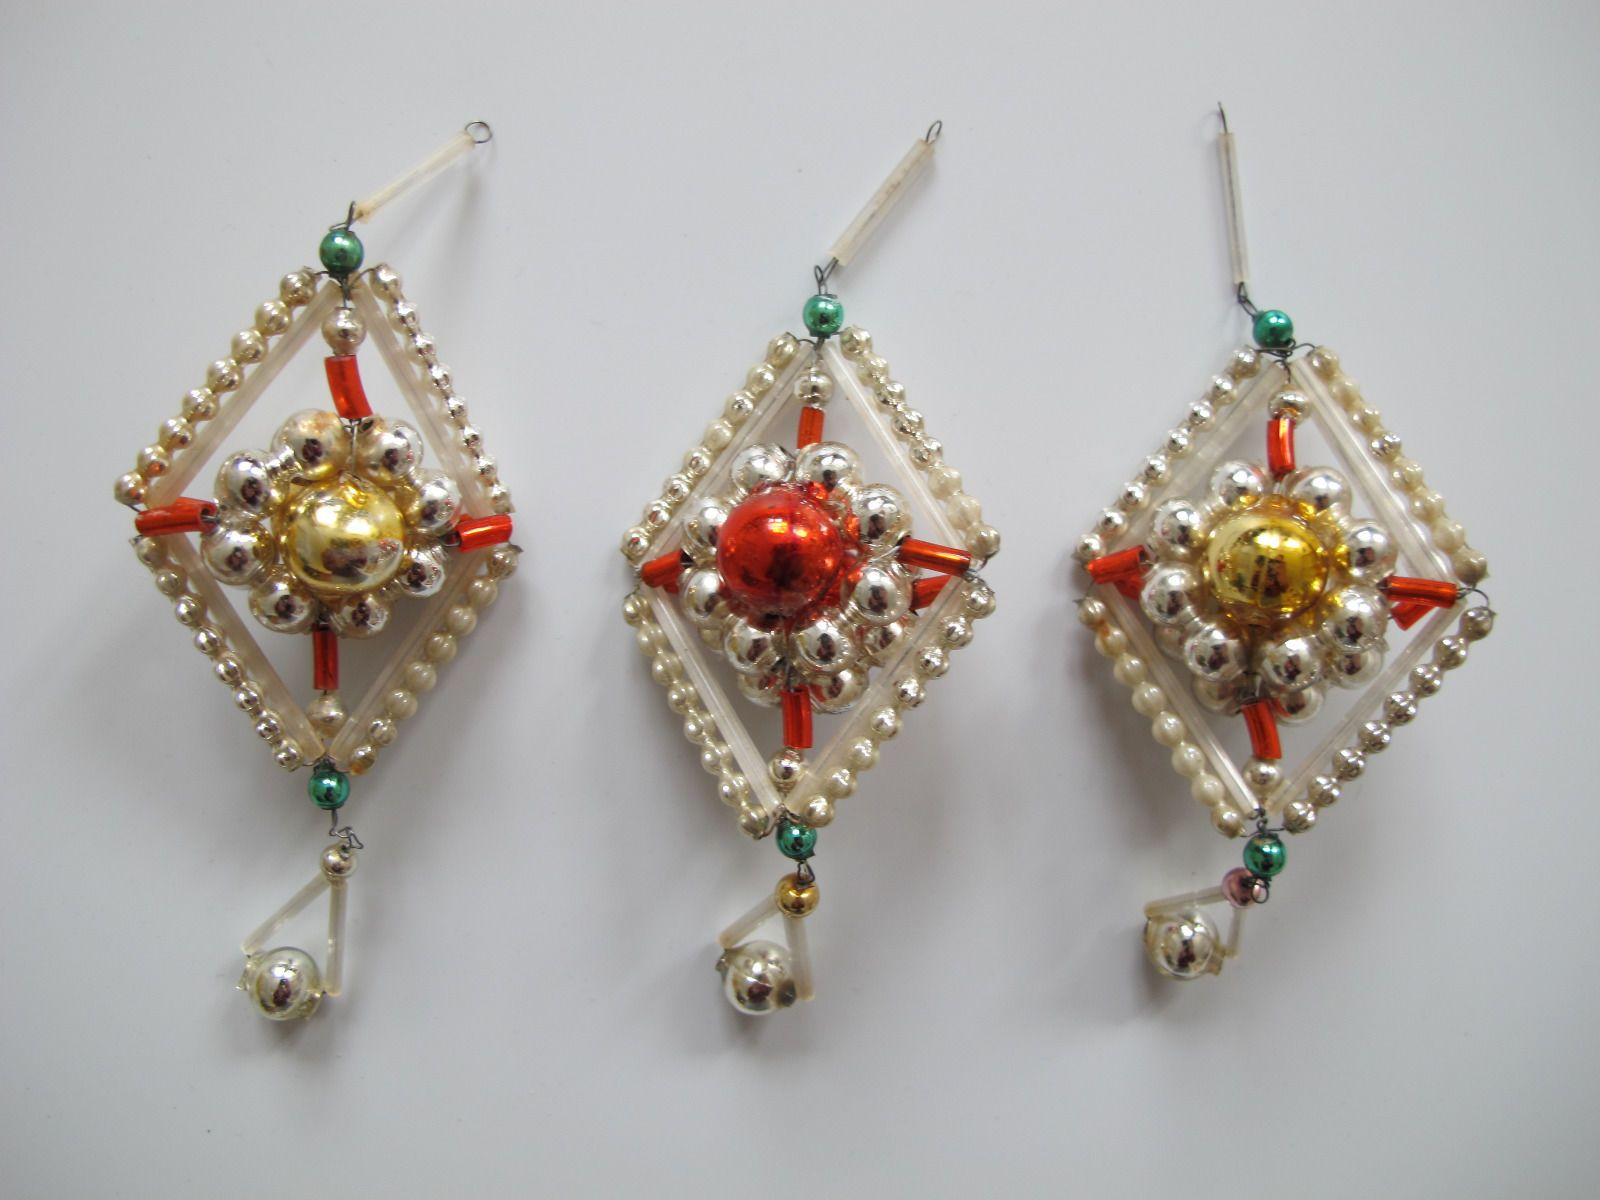 3 Stück original antike Gablonzer Christbaumschmuck Objekte ...